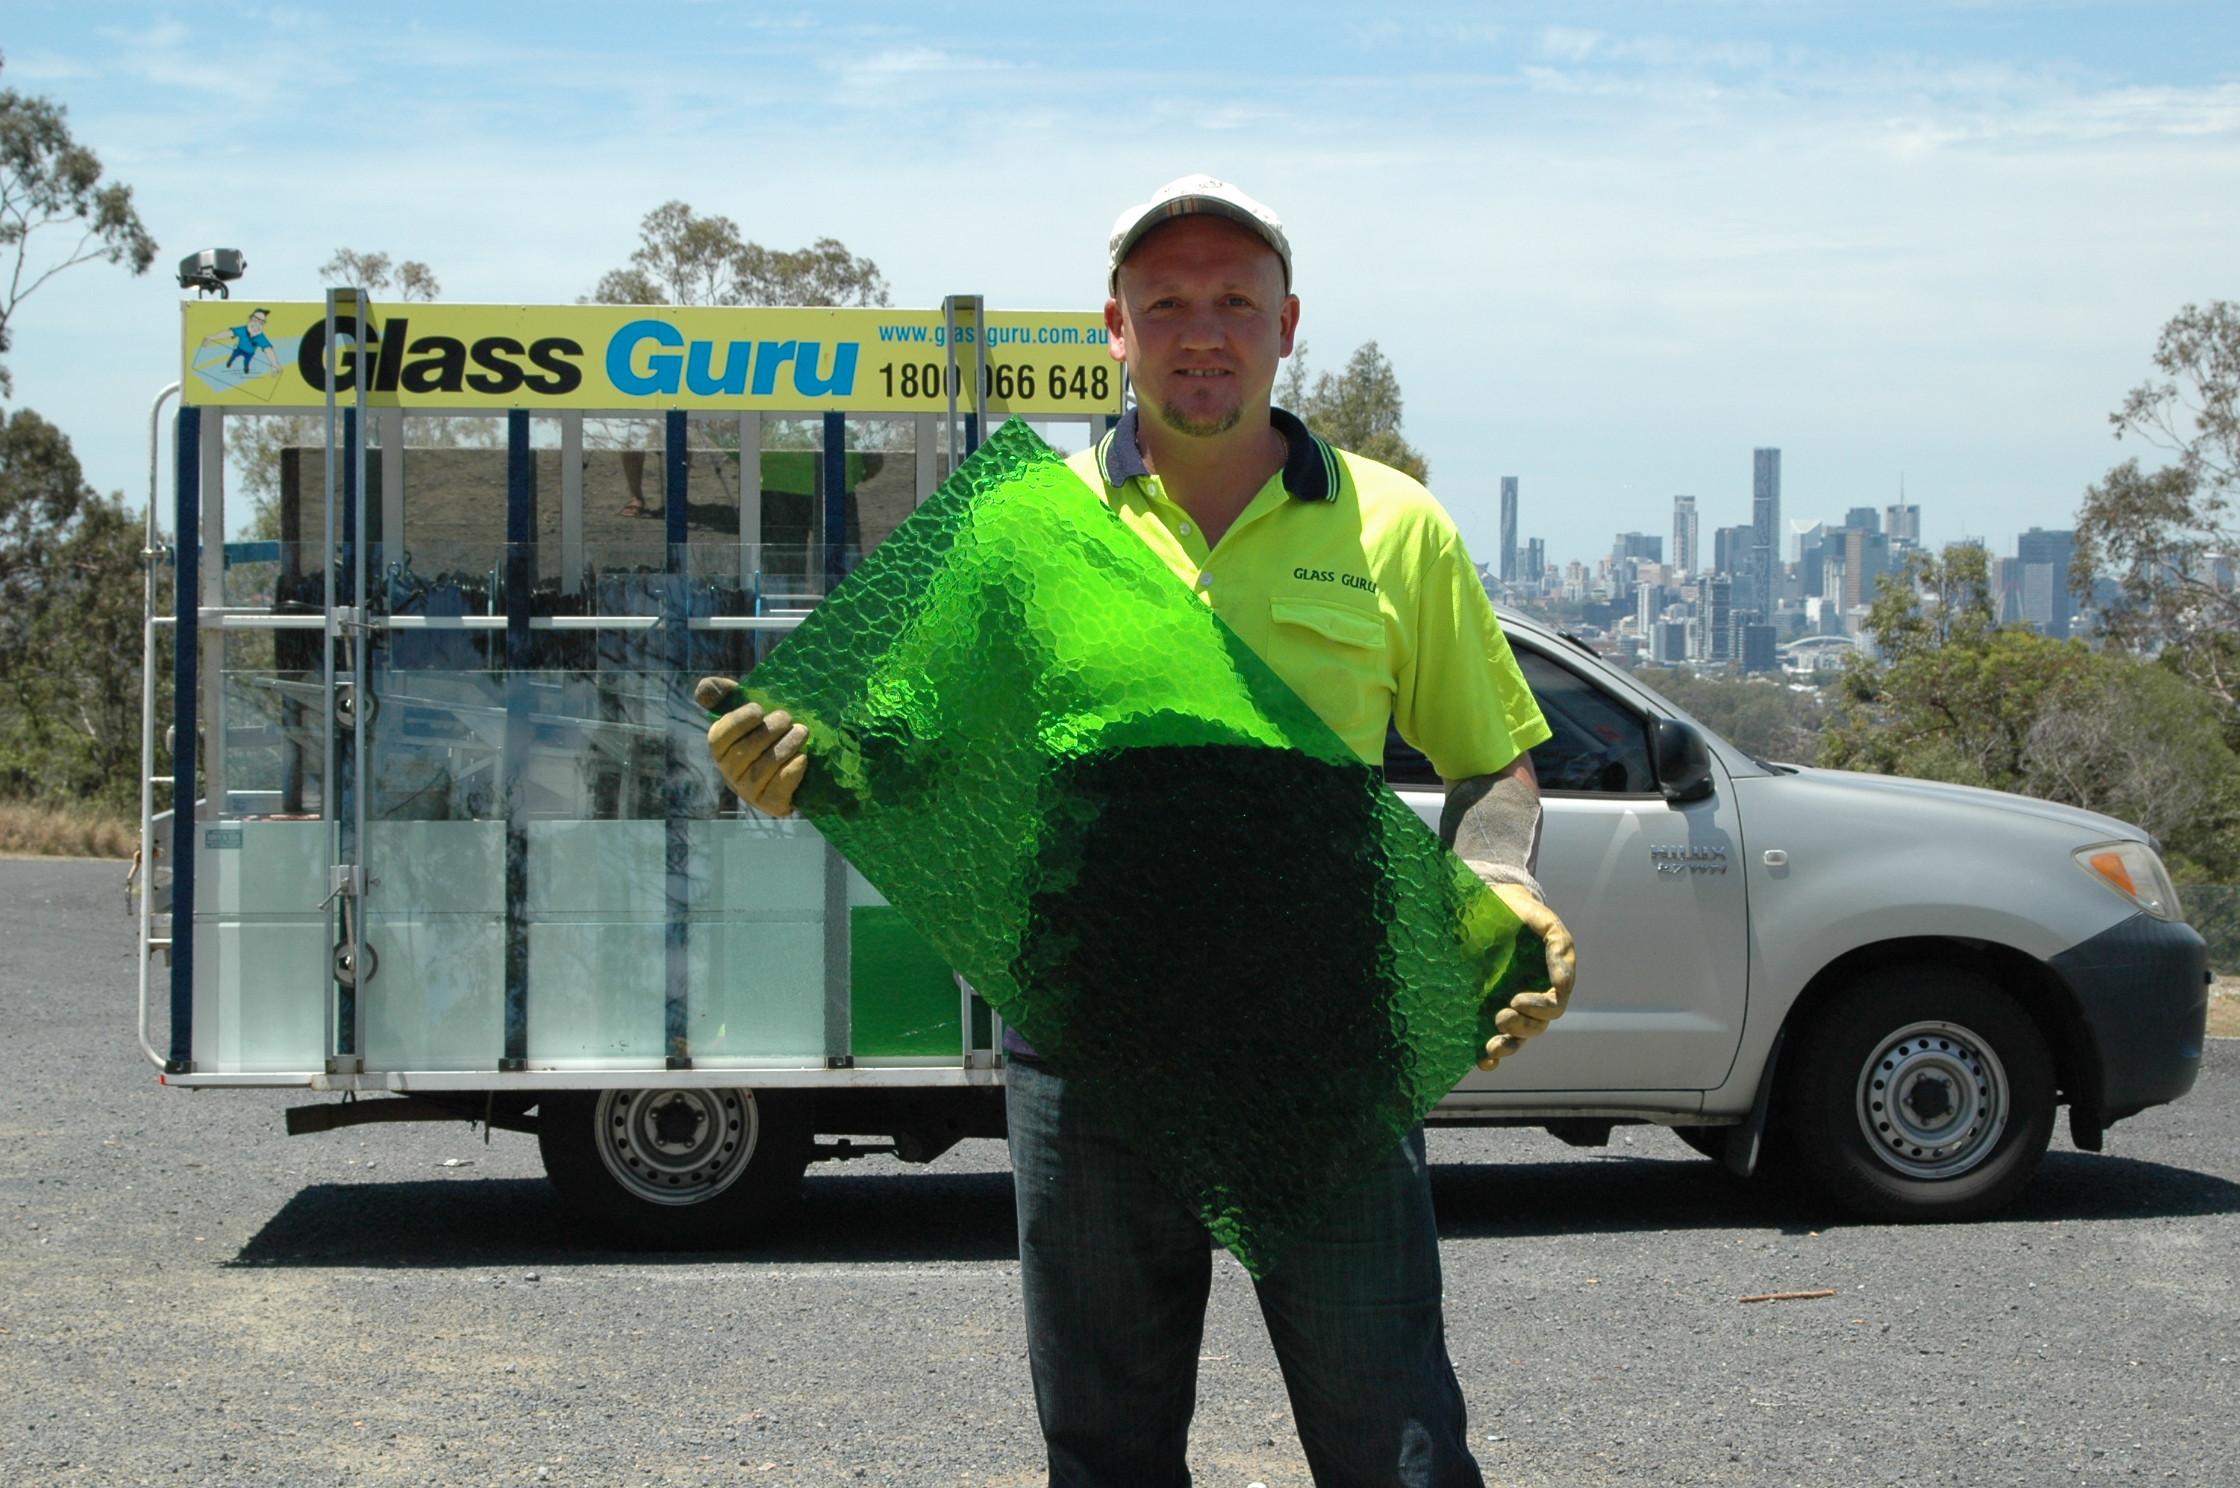 Glass Guru home & office glass replacement. Mobile window glass repair & speedy onsite glazing services in Brisbane